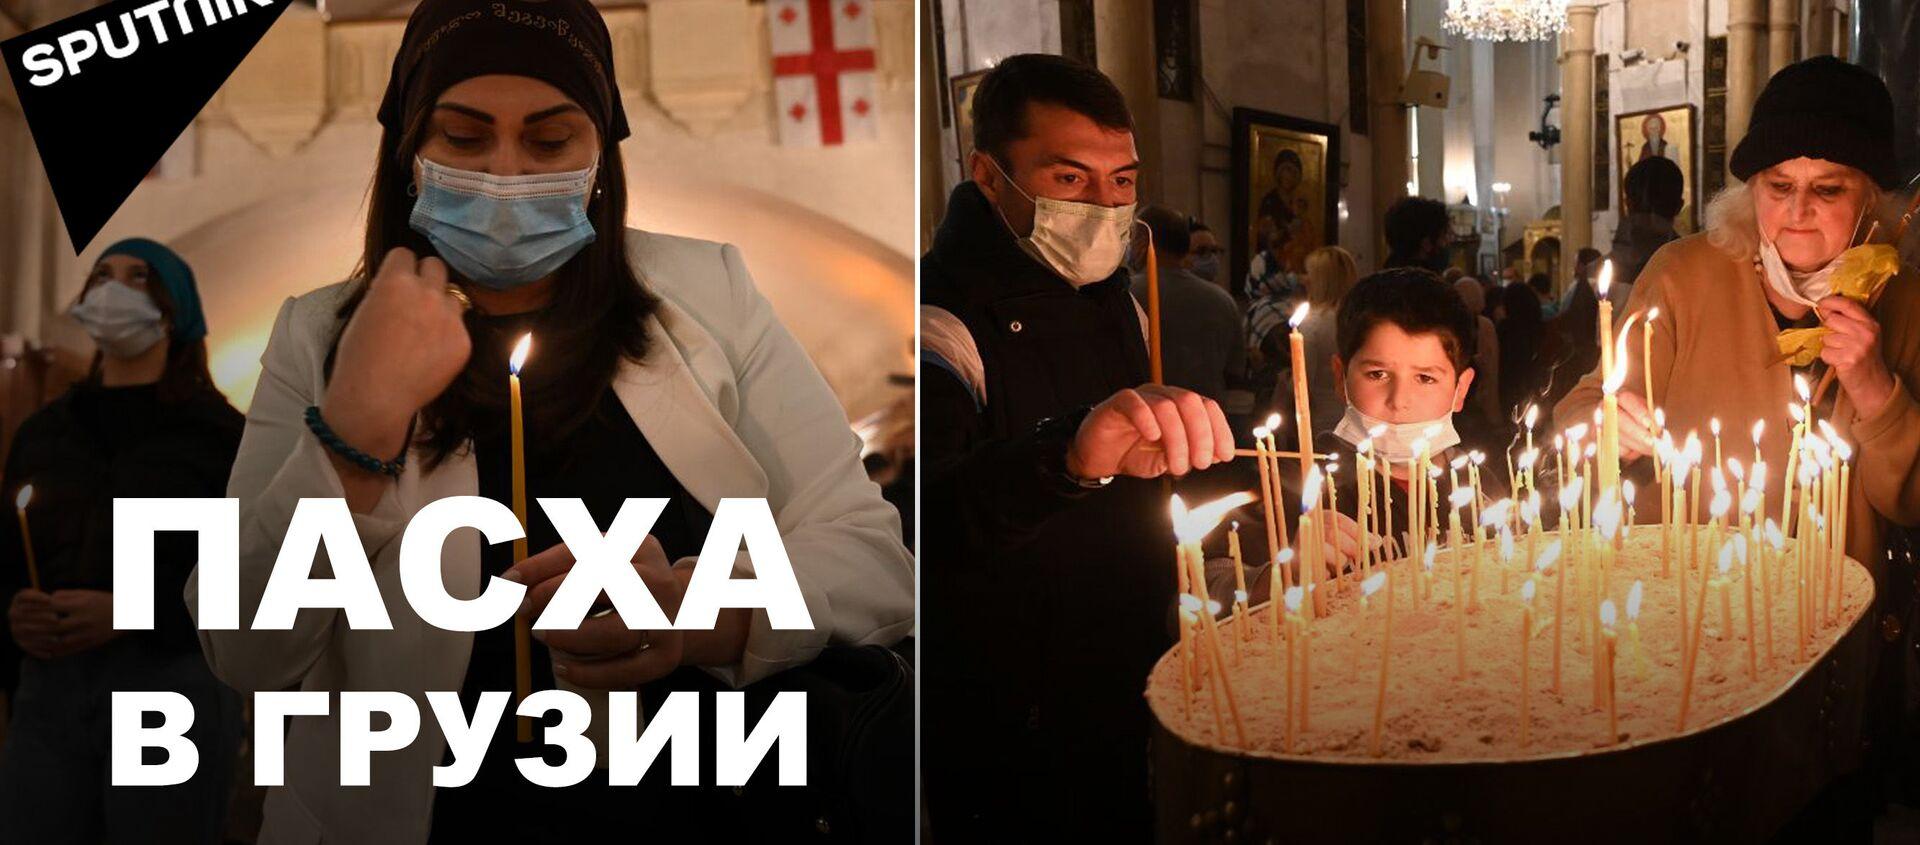 В Грузии отмечают Пасху: праздничная служба в храме Самеба - видео - Sputnik Грузия, 1920, 02.05.2021